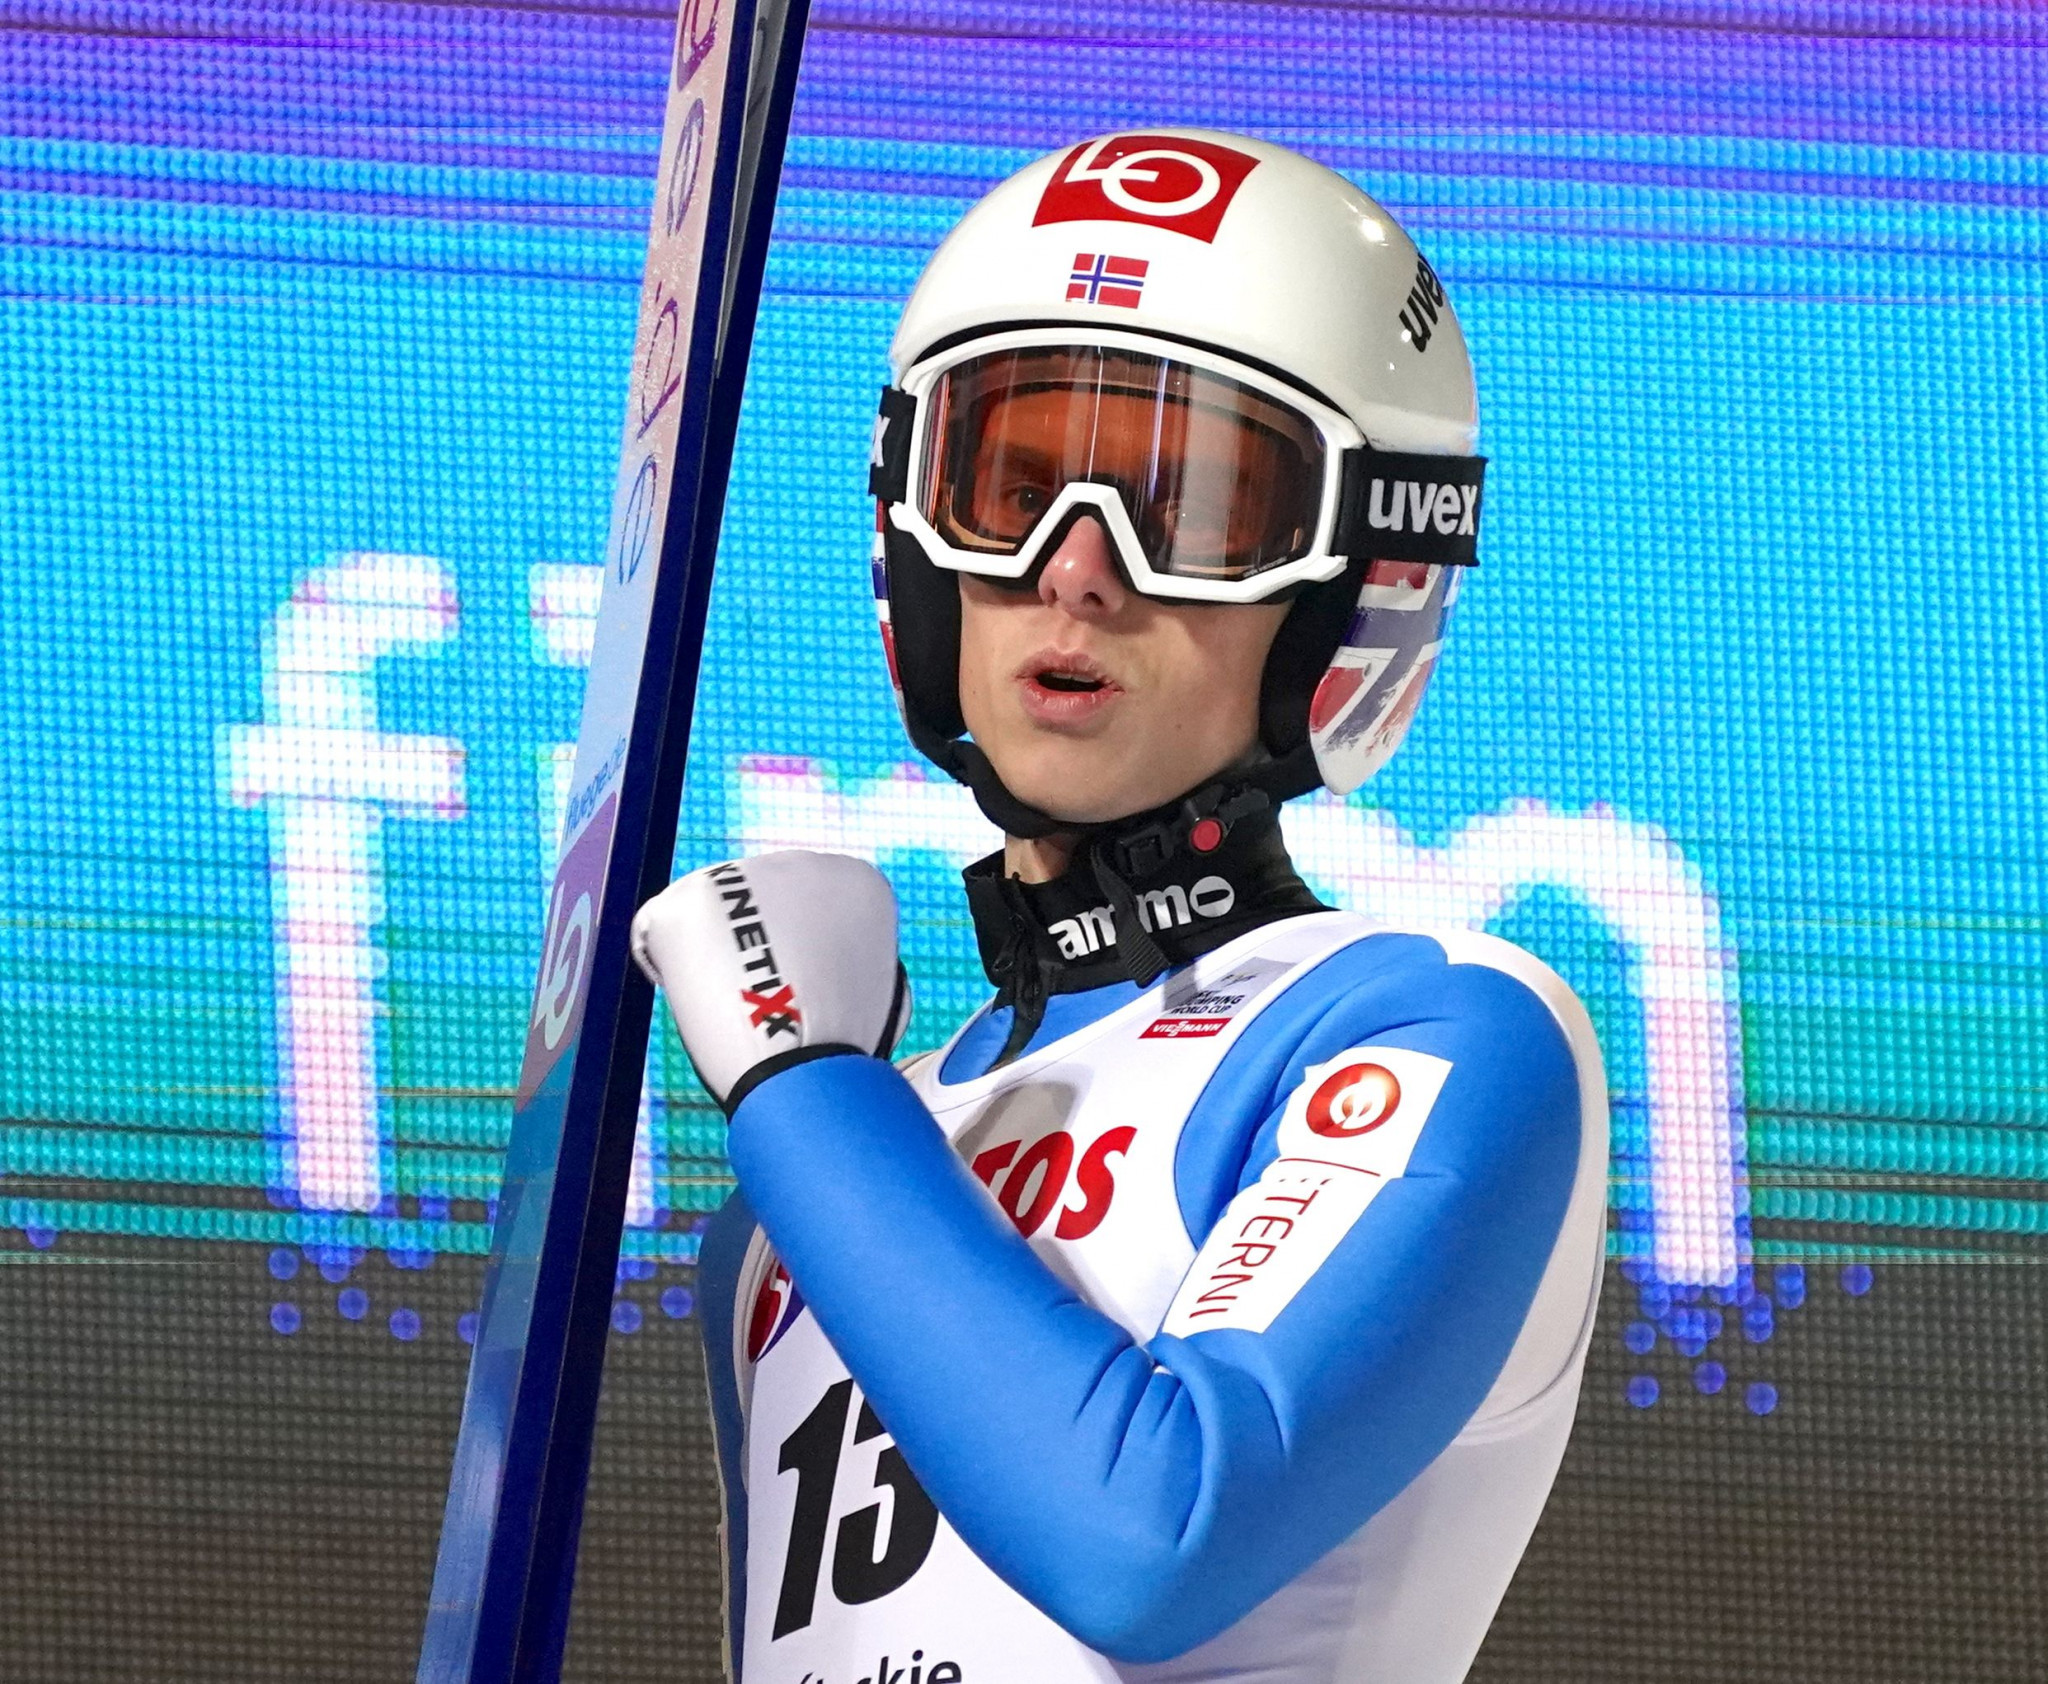 Granerud seeking fifth Ski Jumping World Cup win in a row in Zakopane